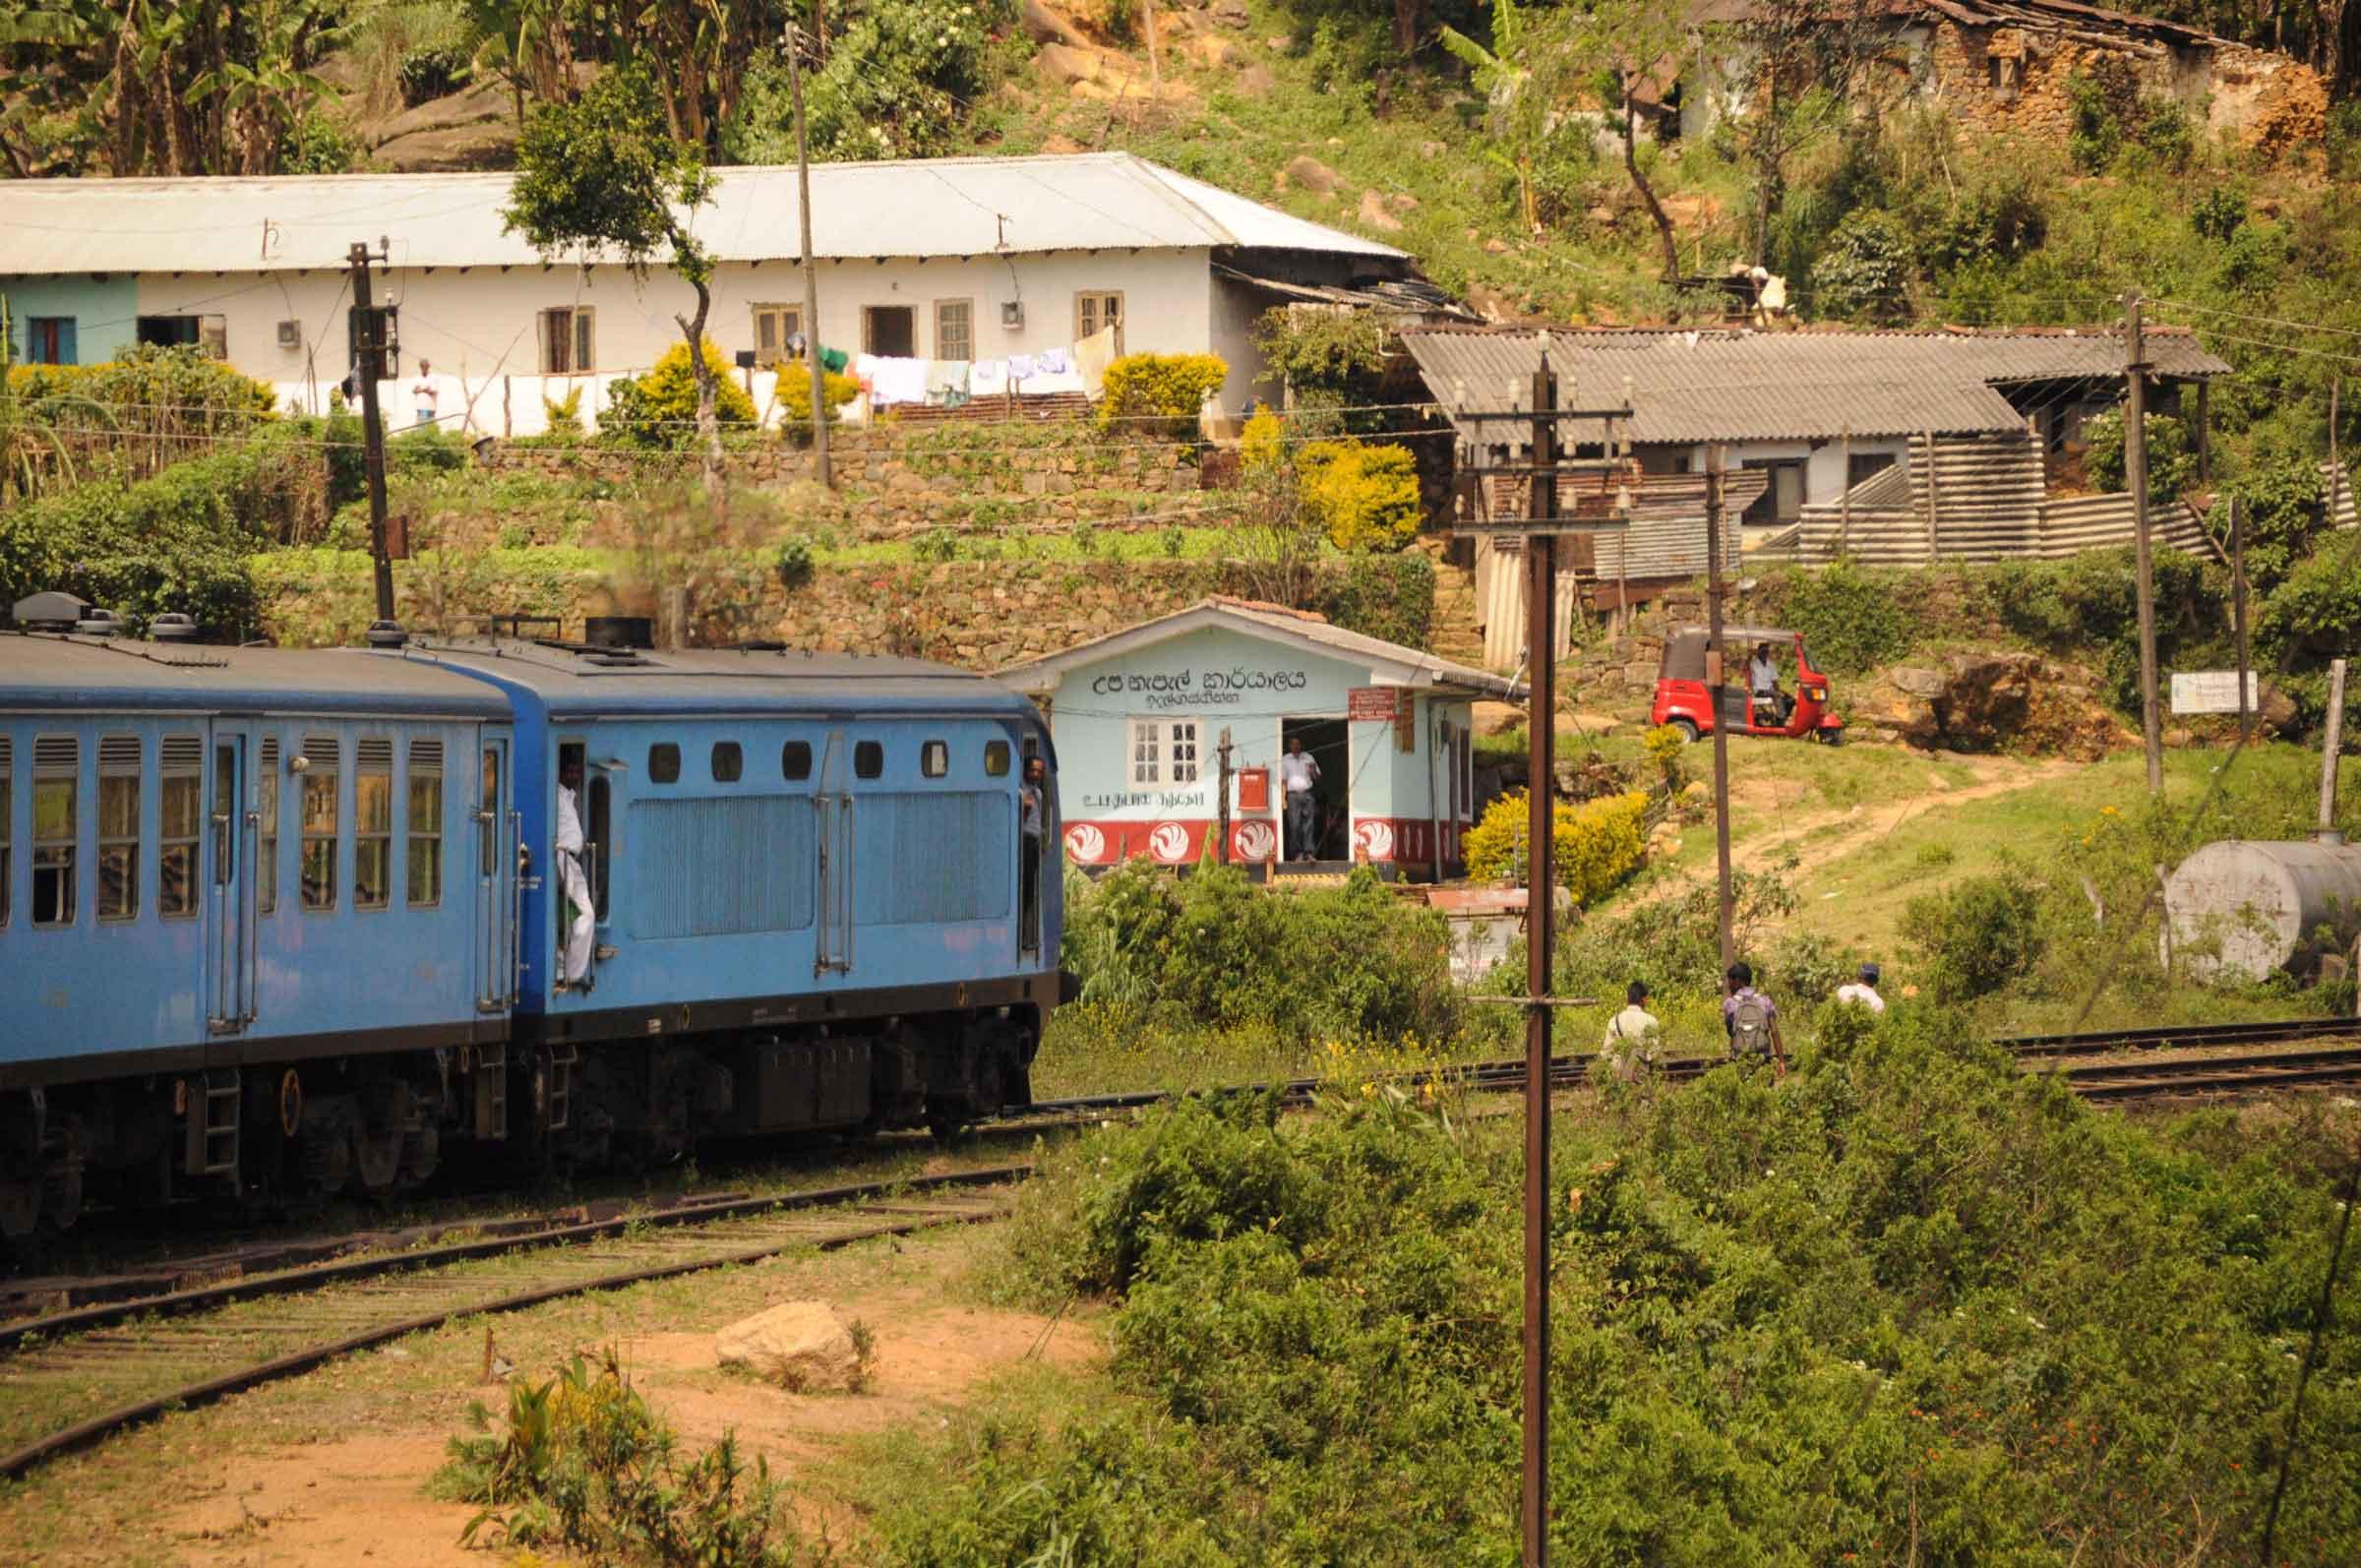 Zugfahren in Sri Lanka ist großartig 2